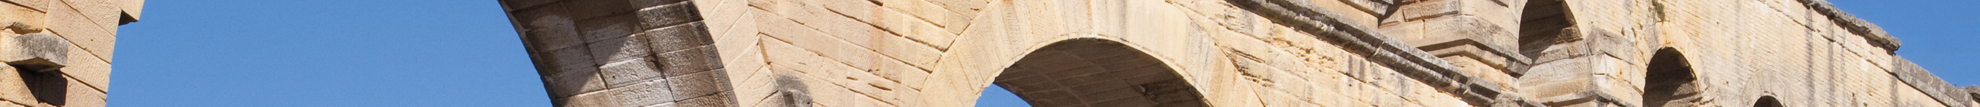 IREM - Turbinas Banki TBA acueducto